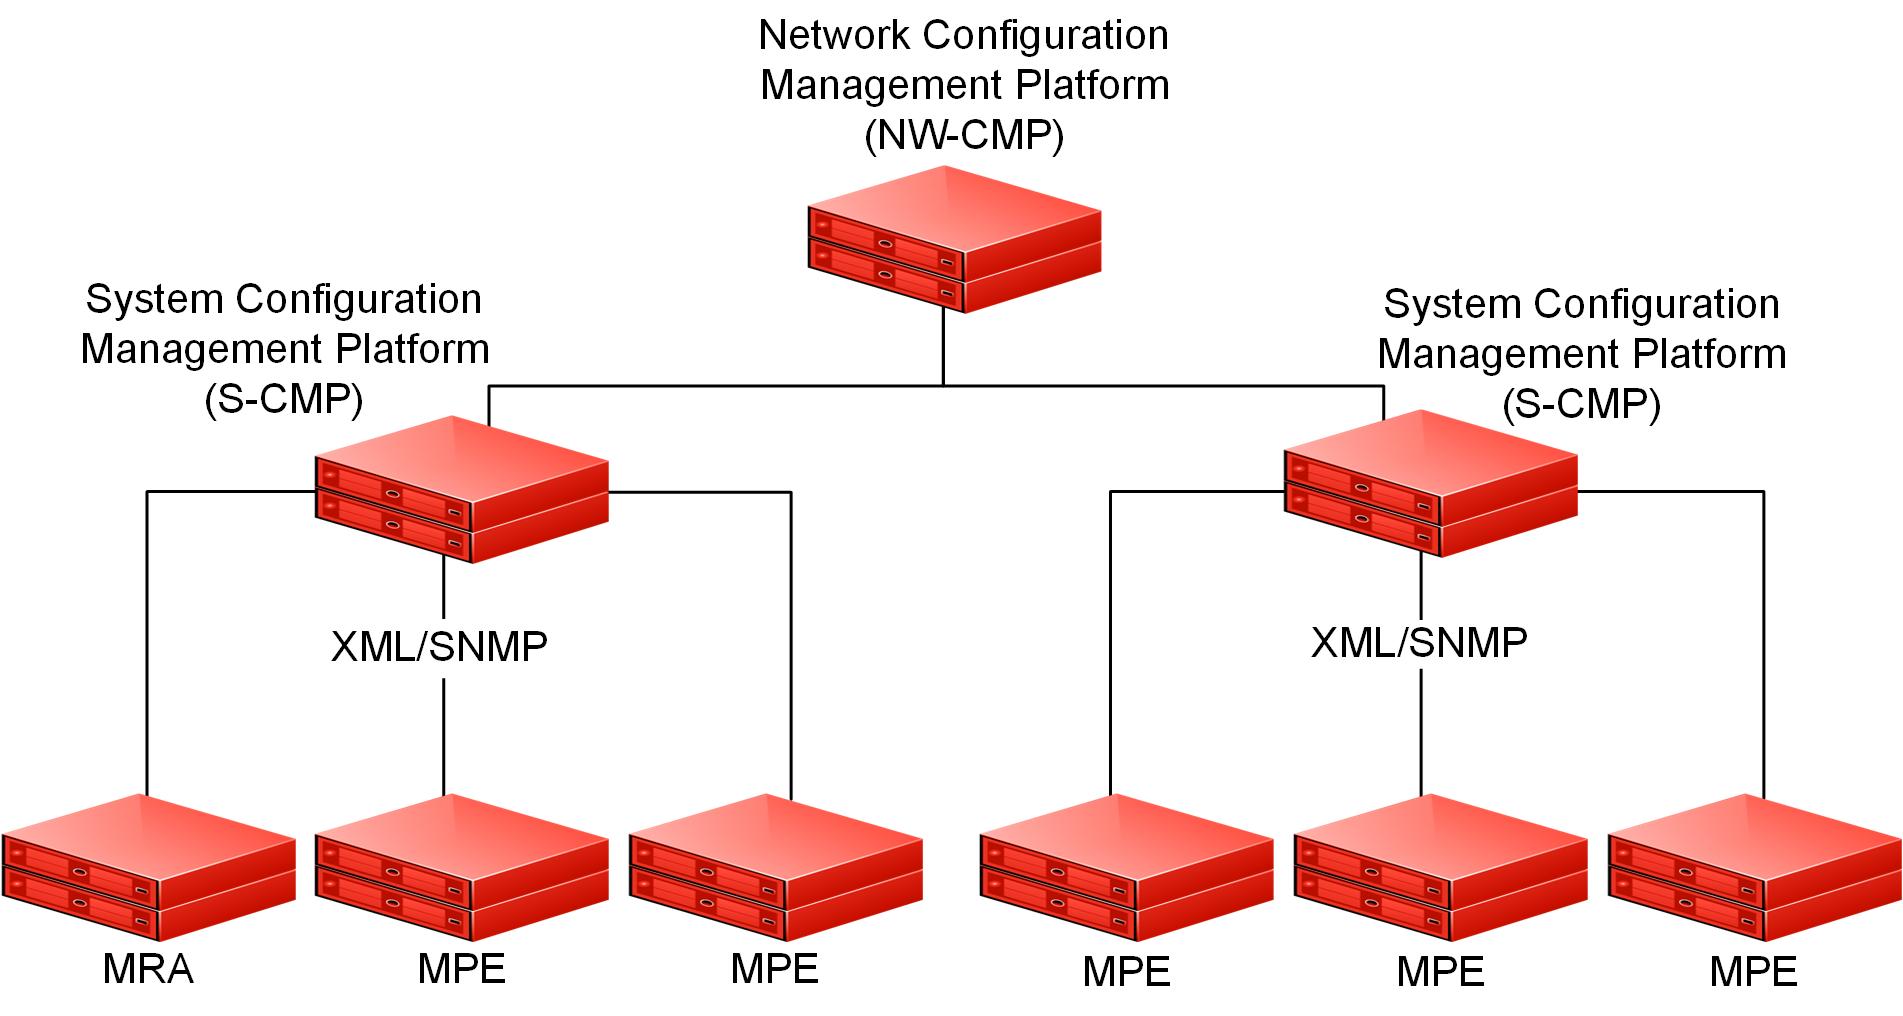 Network Configuration Management Platform